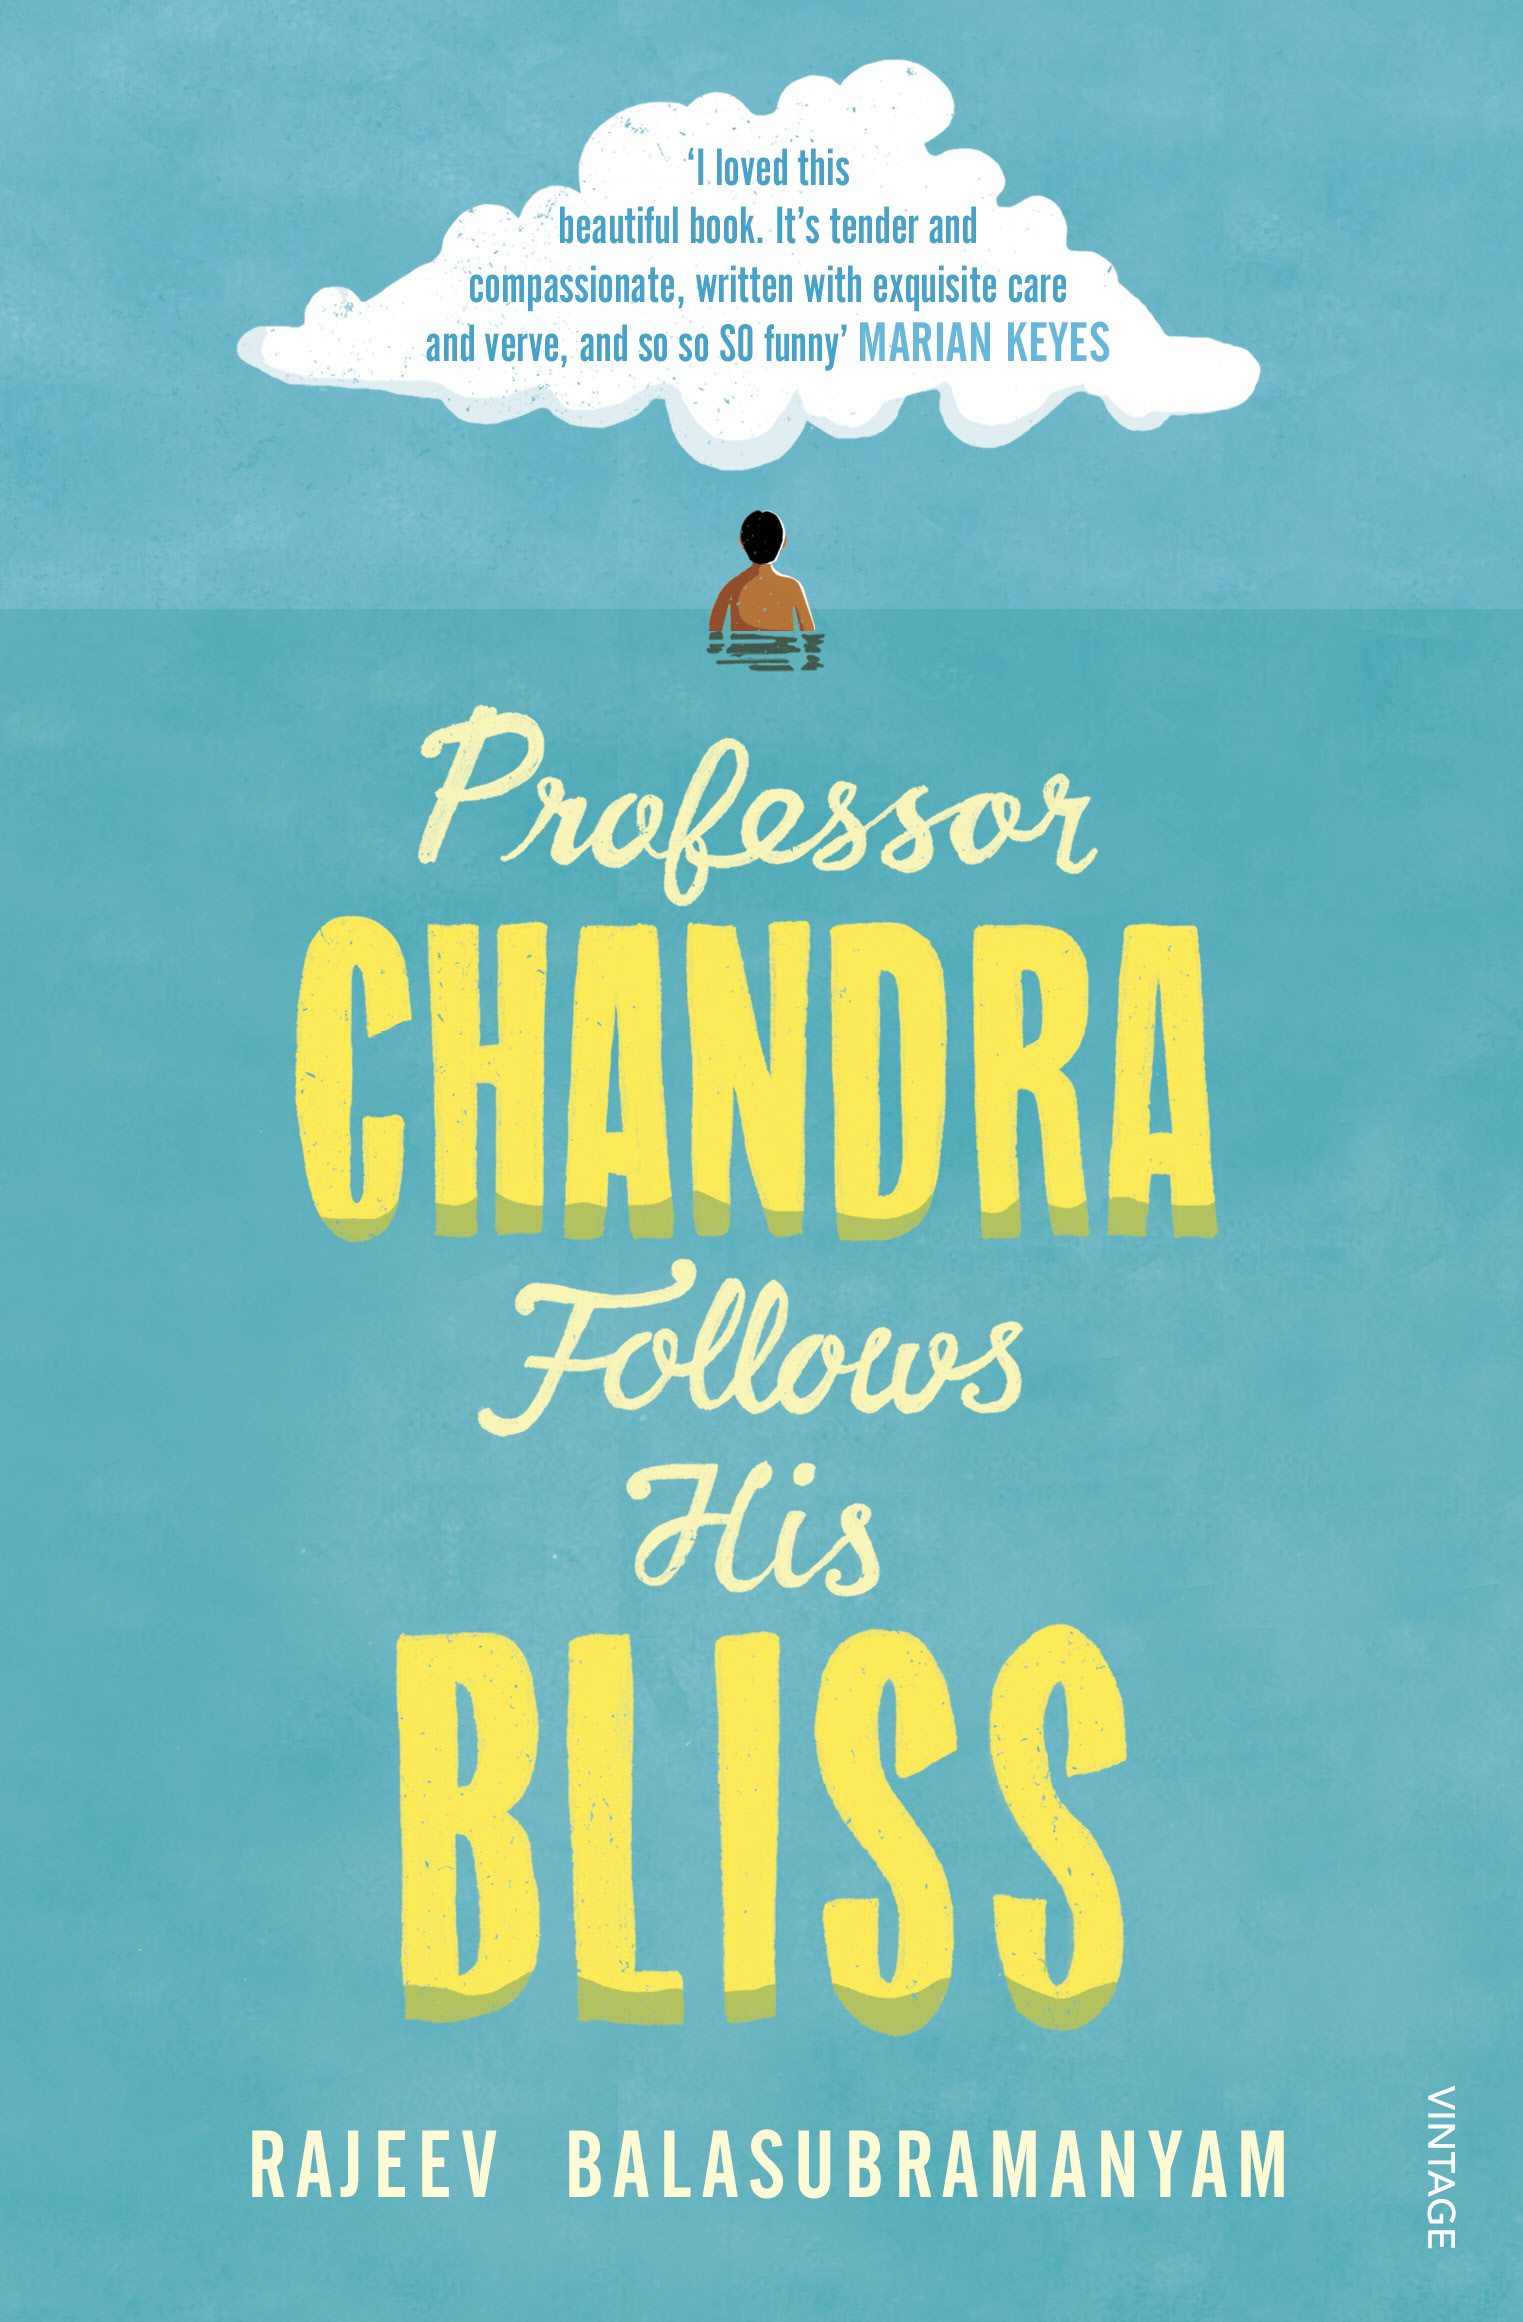 Chandra pb